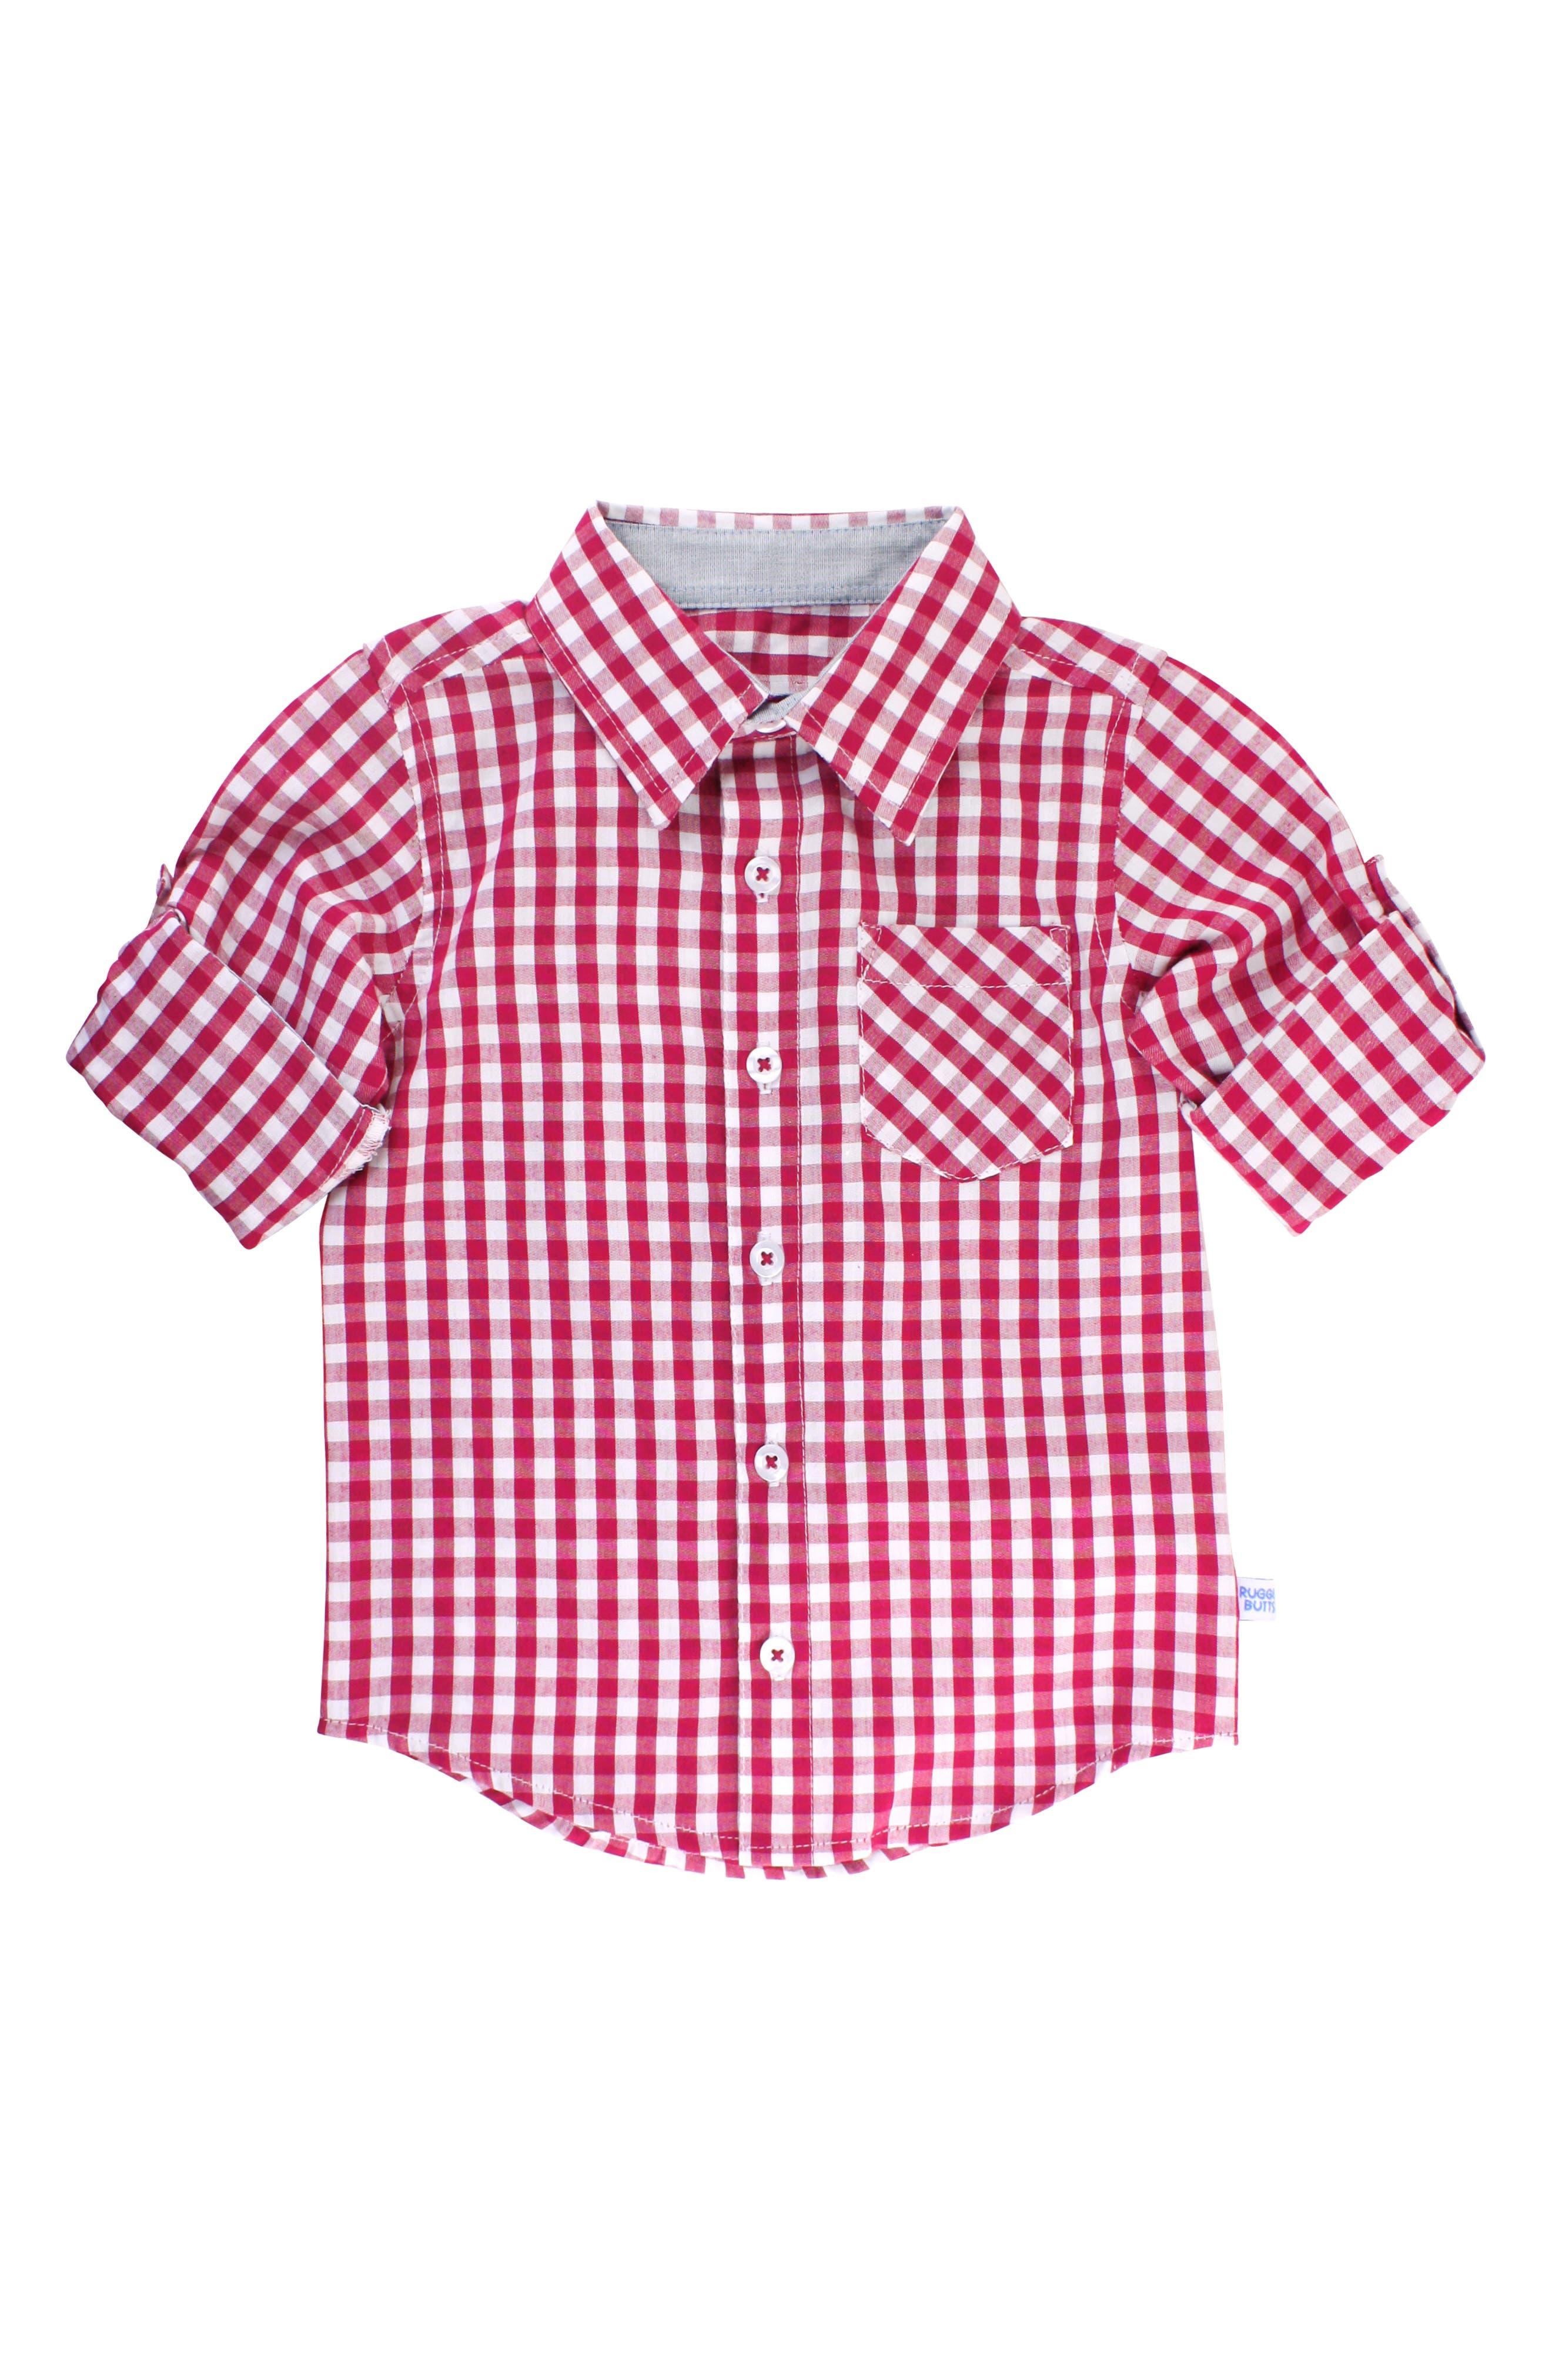 RUGGEDBUTTS, Gingham Shirt & Pullover Sweater Set, Alternate thumbnail 2, color, 300